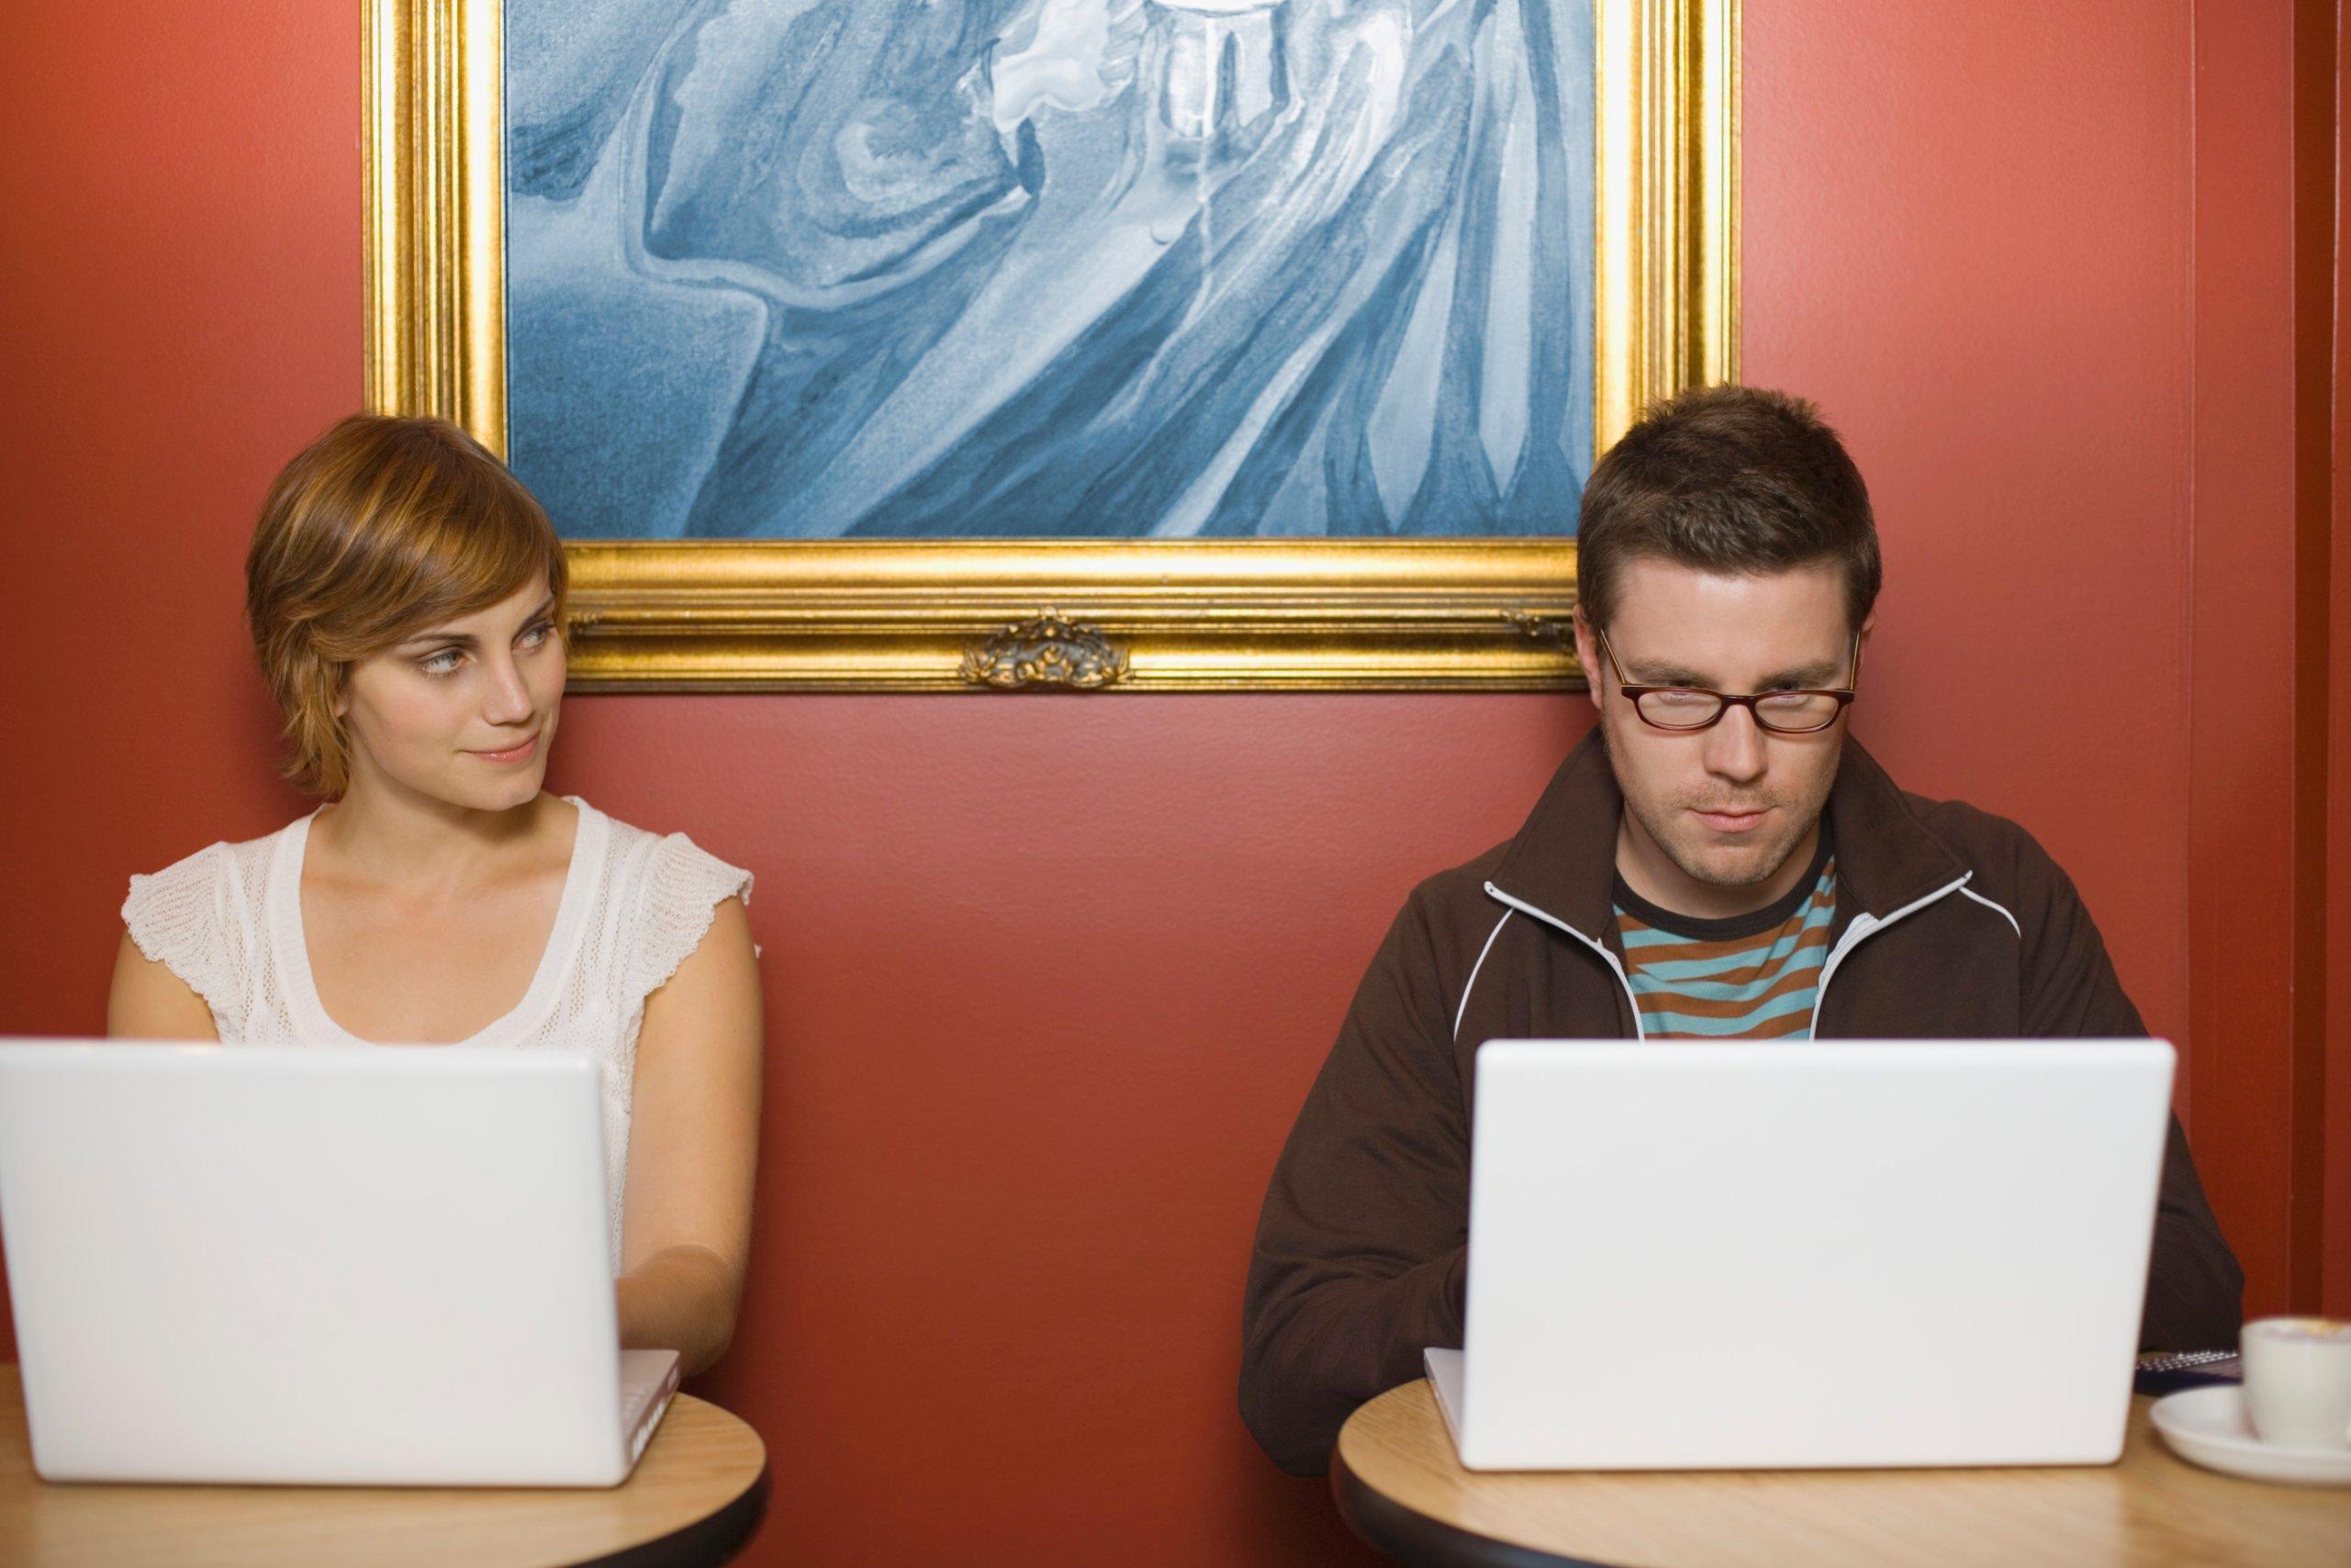 cultura dating online)